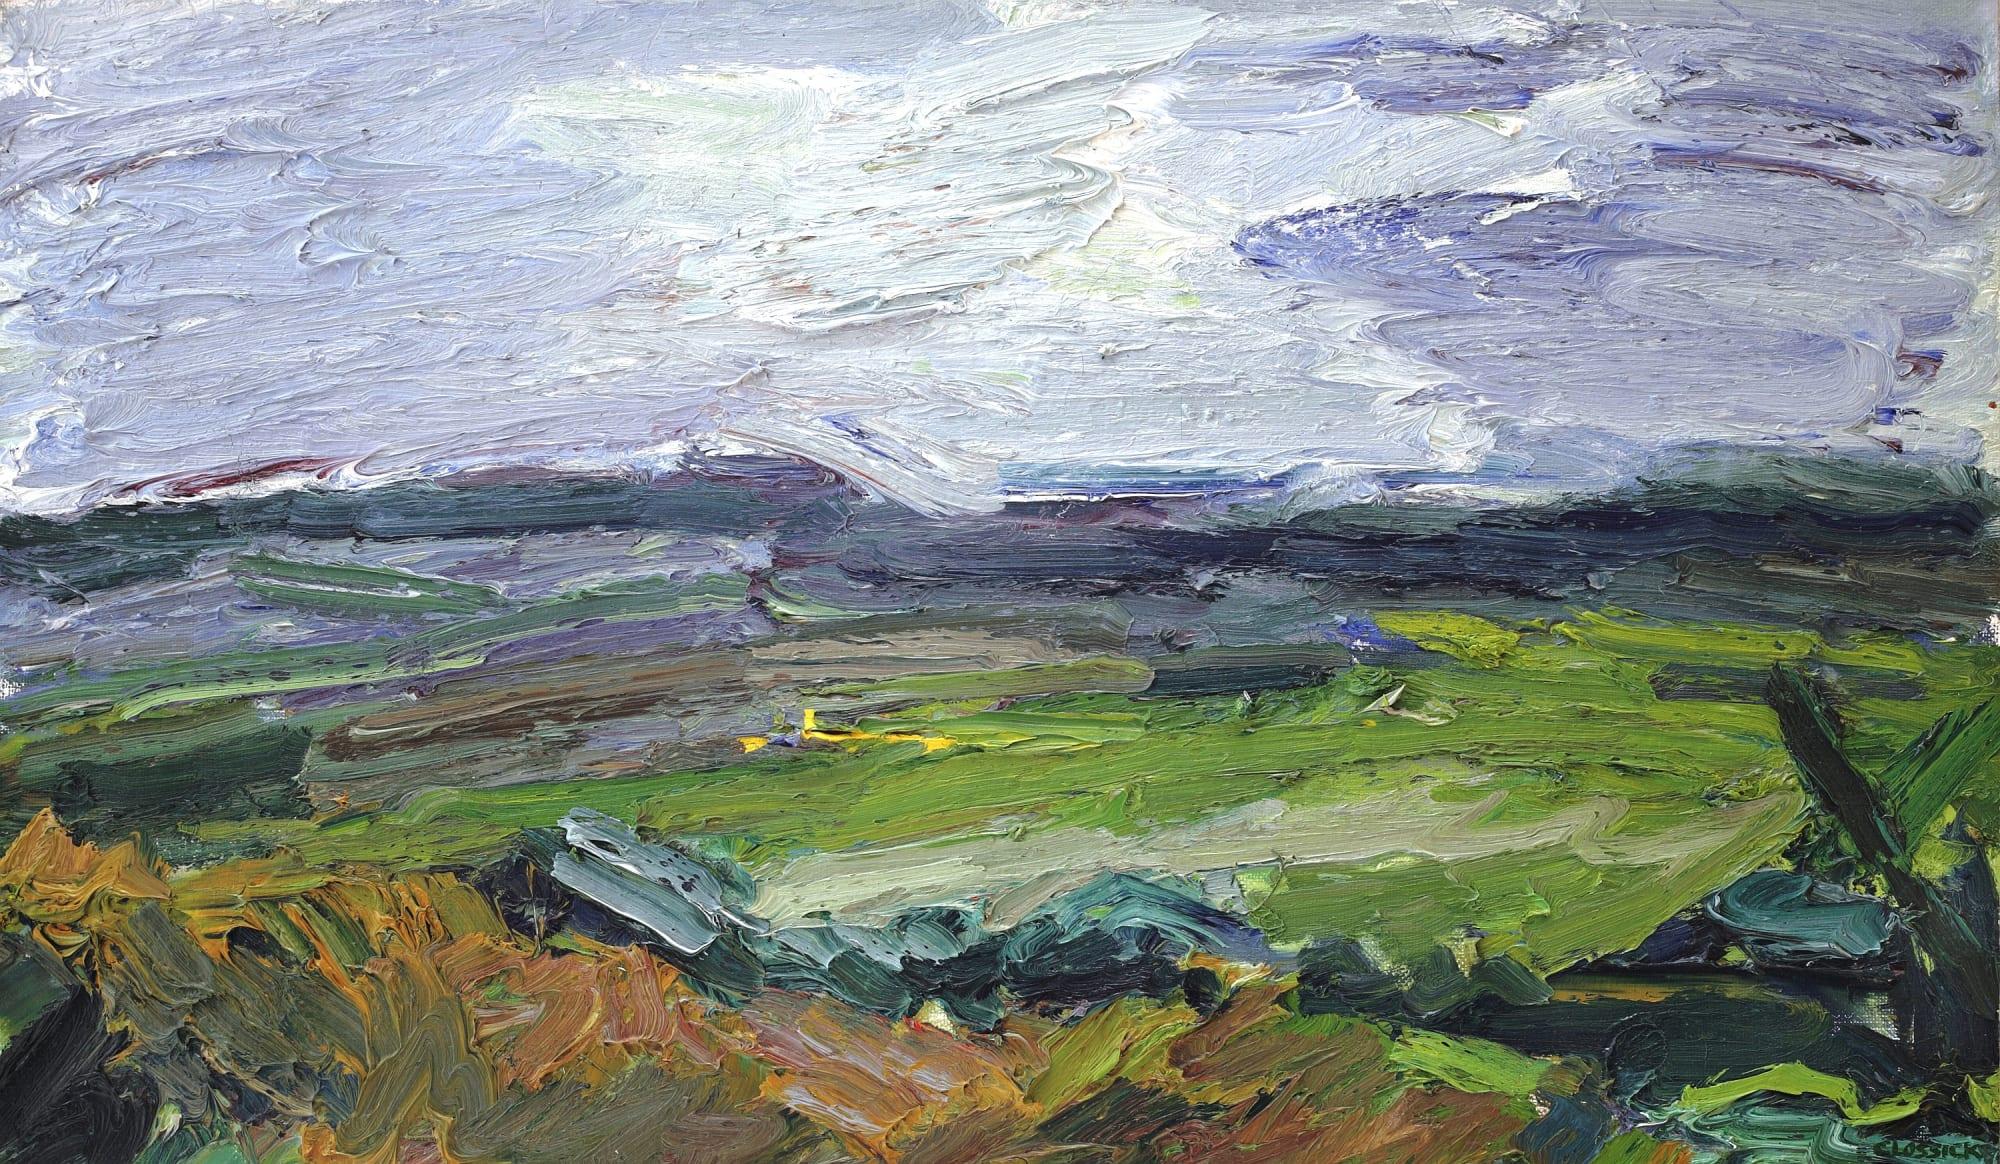 Peter Clossick: North Downs